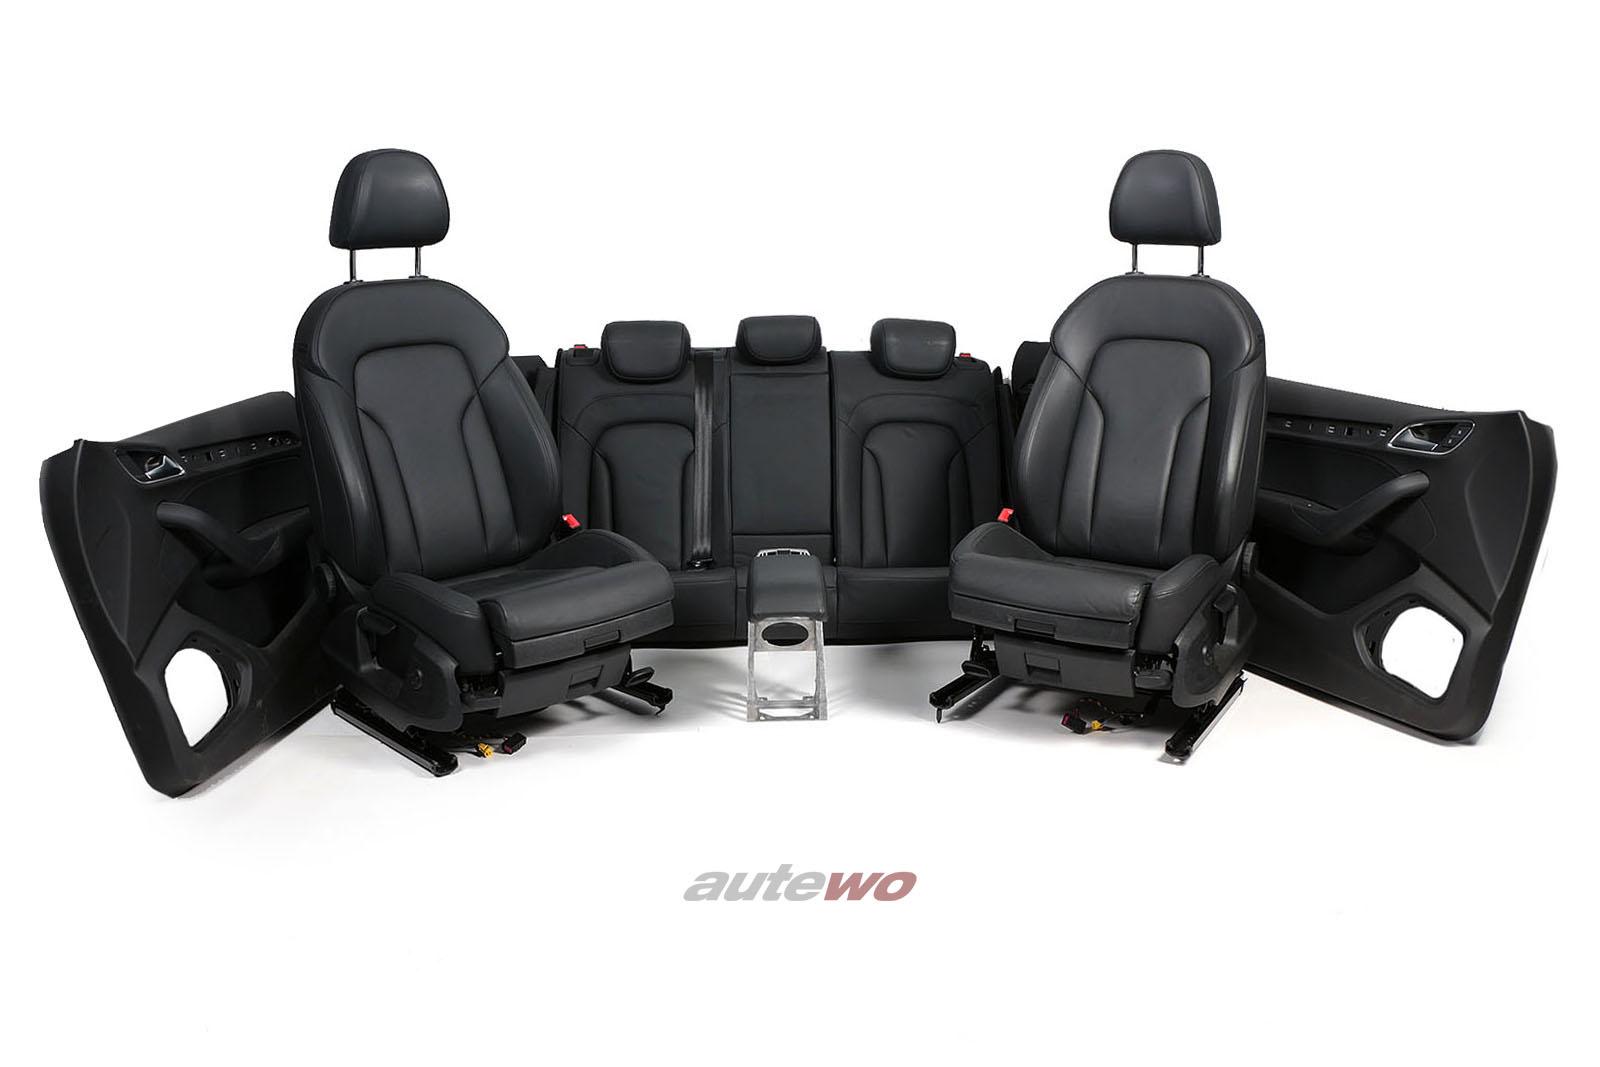 Audi Q3 8U Innenausstattung/Sportsitze Leder soul schwarz FZ komplett neuwertig